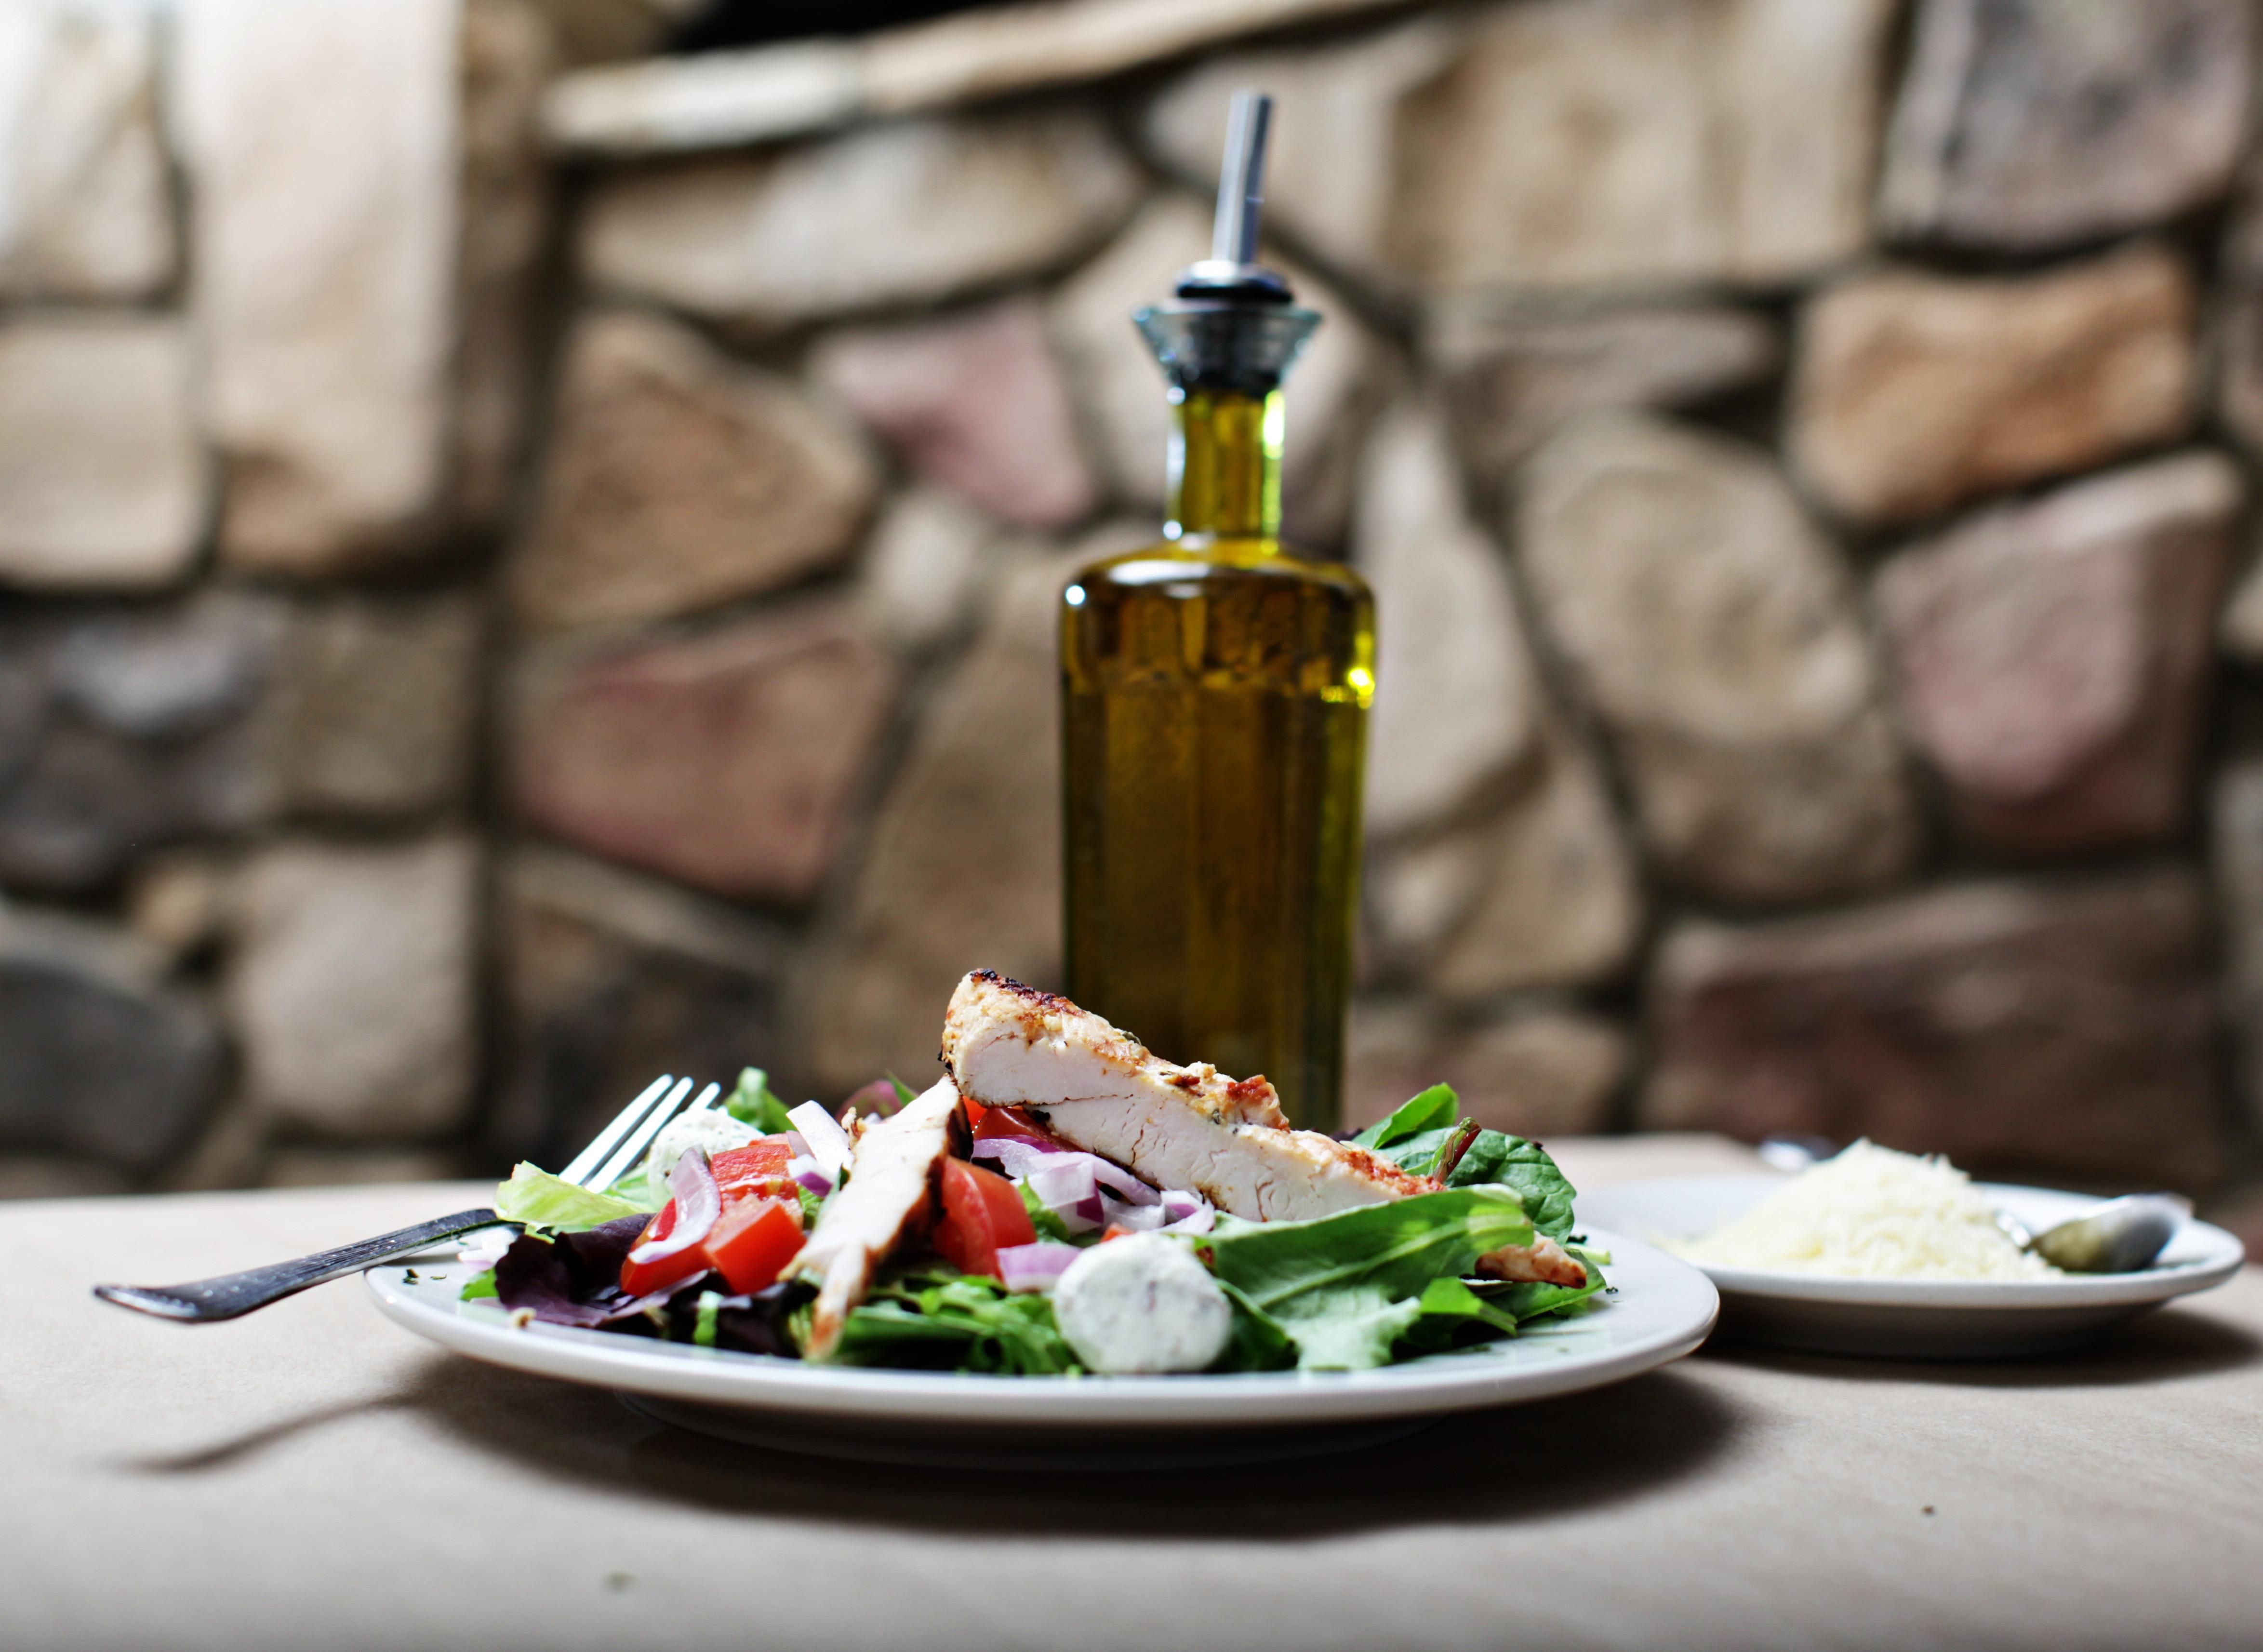 Italian Restaurant Near Me: Lucia's Italian Restaurant Coupons Near Me In Roswell